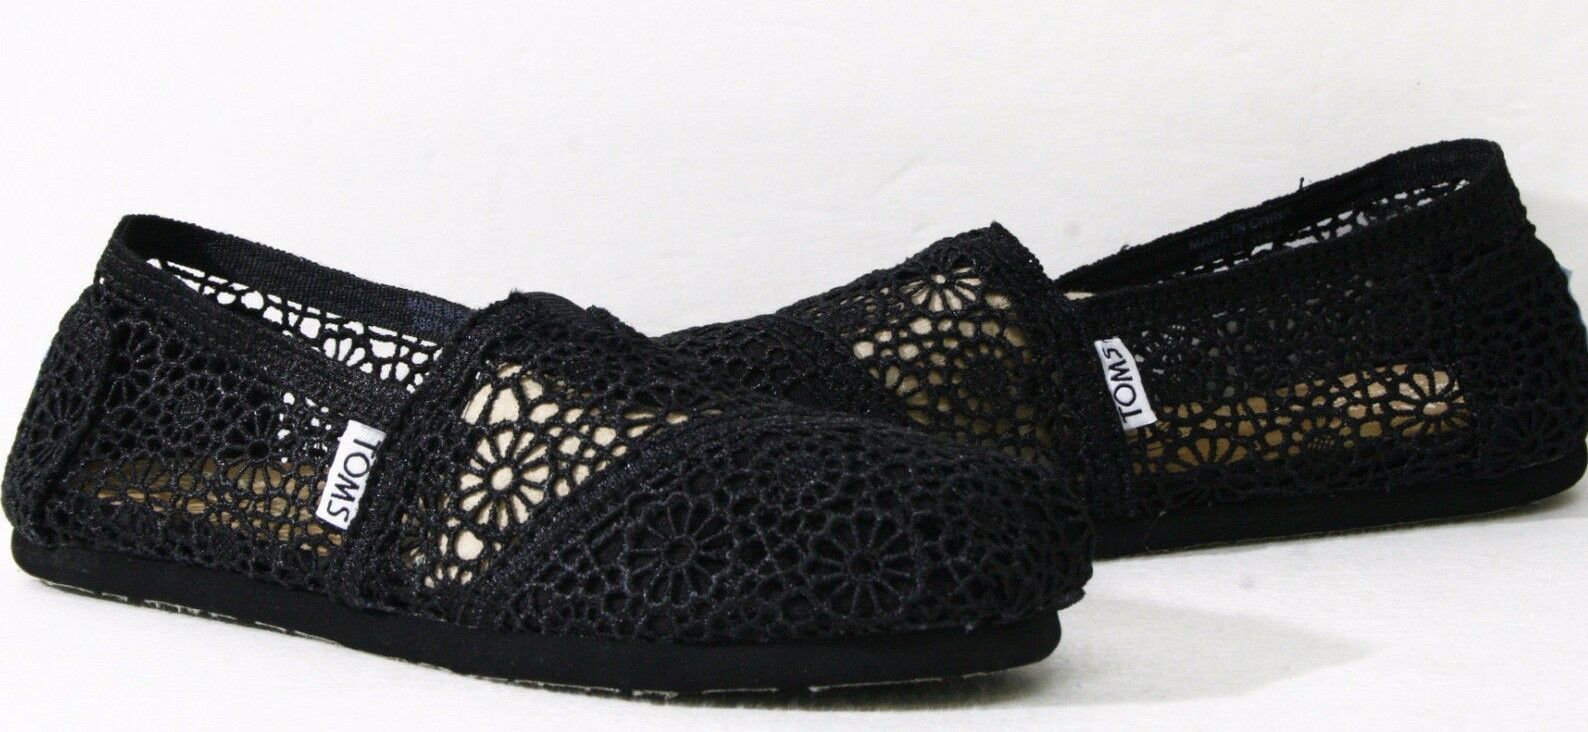 befdc021f874 Toms Womens Classic Crochet Slip on Alpargata Shoe 6.5 Black Morocco ...